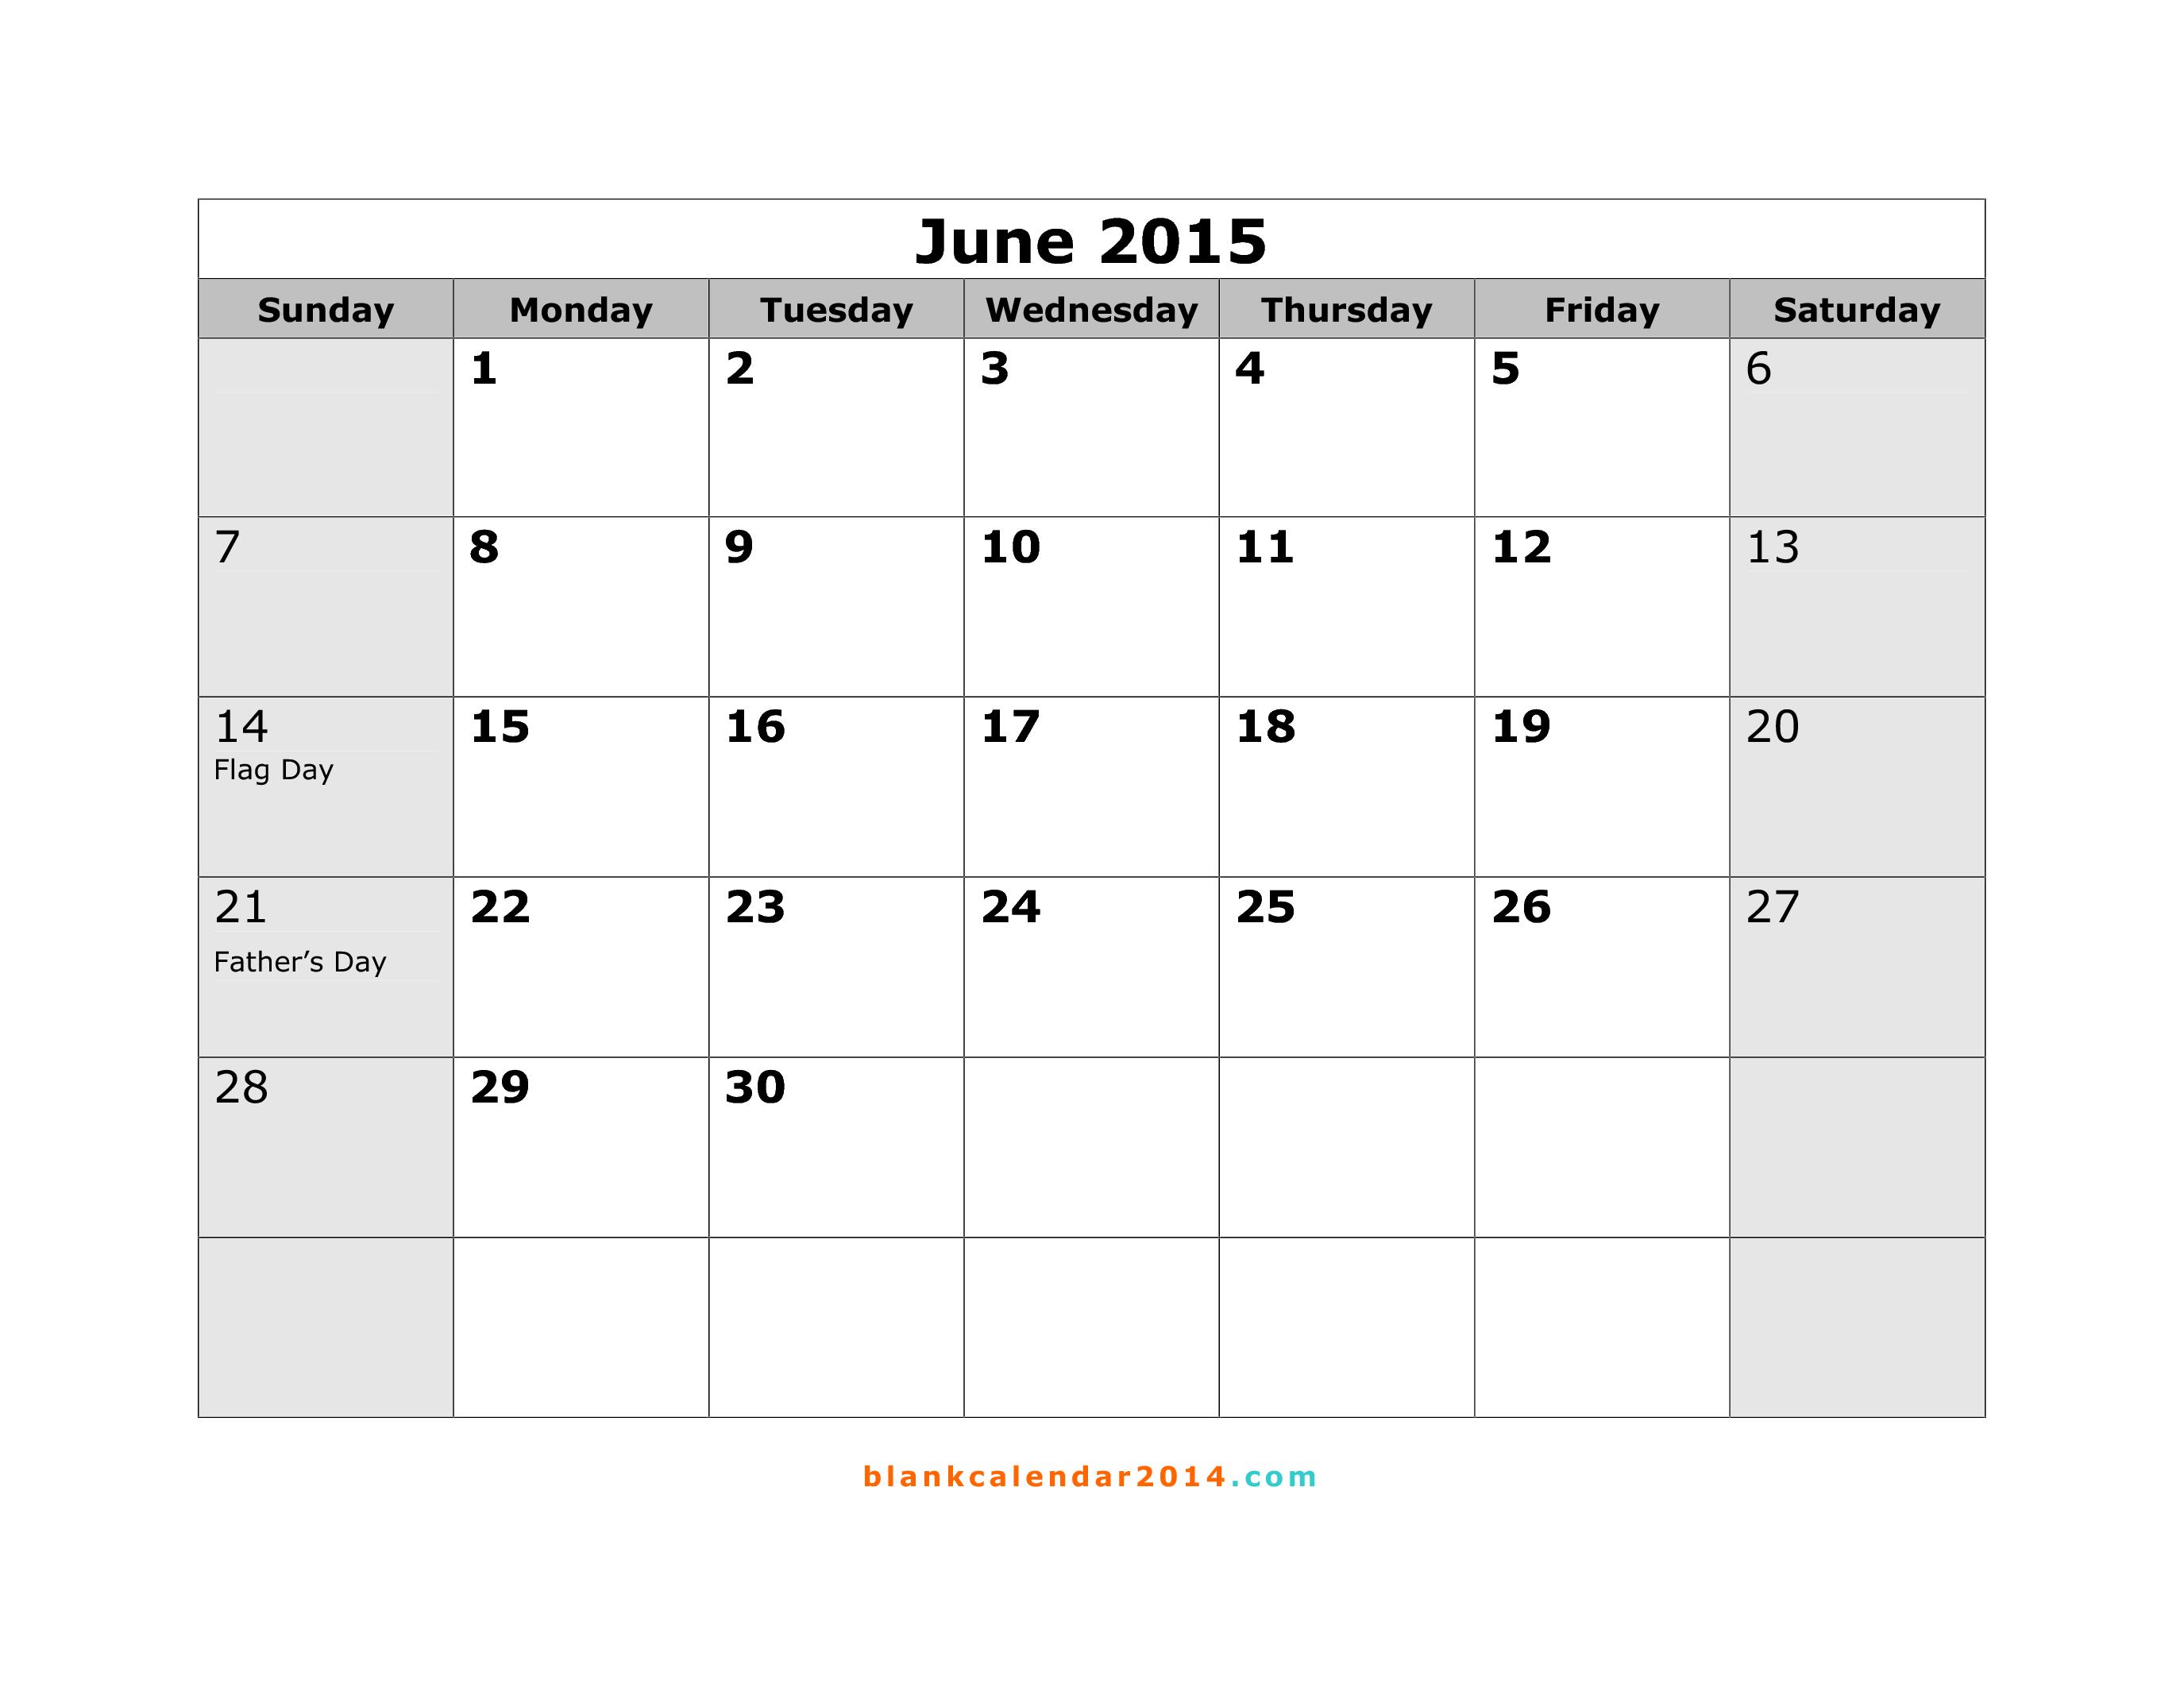 Calendar 2015 june